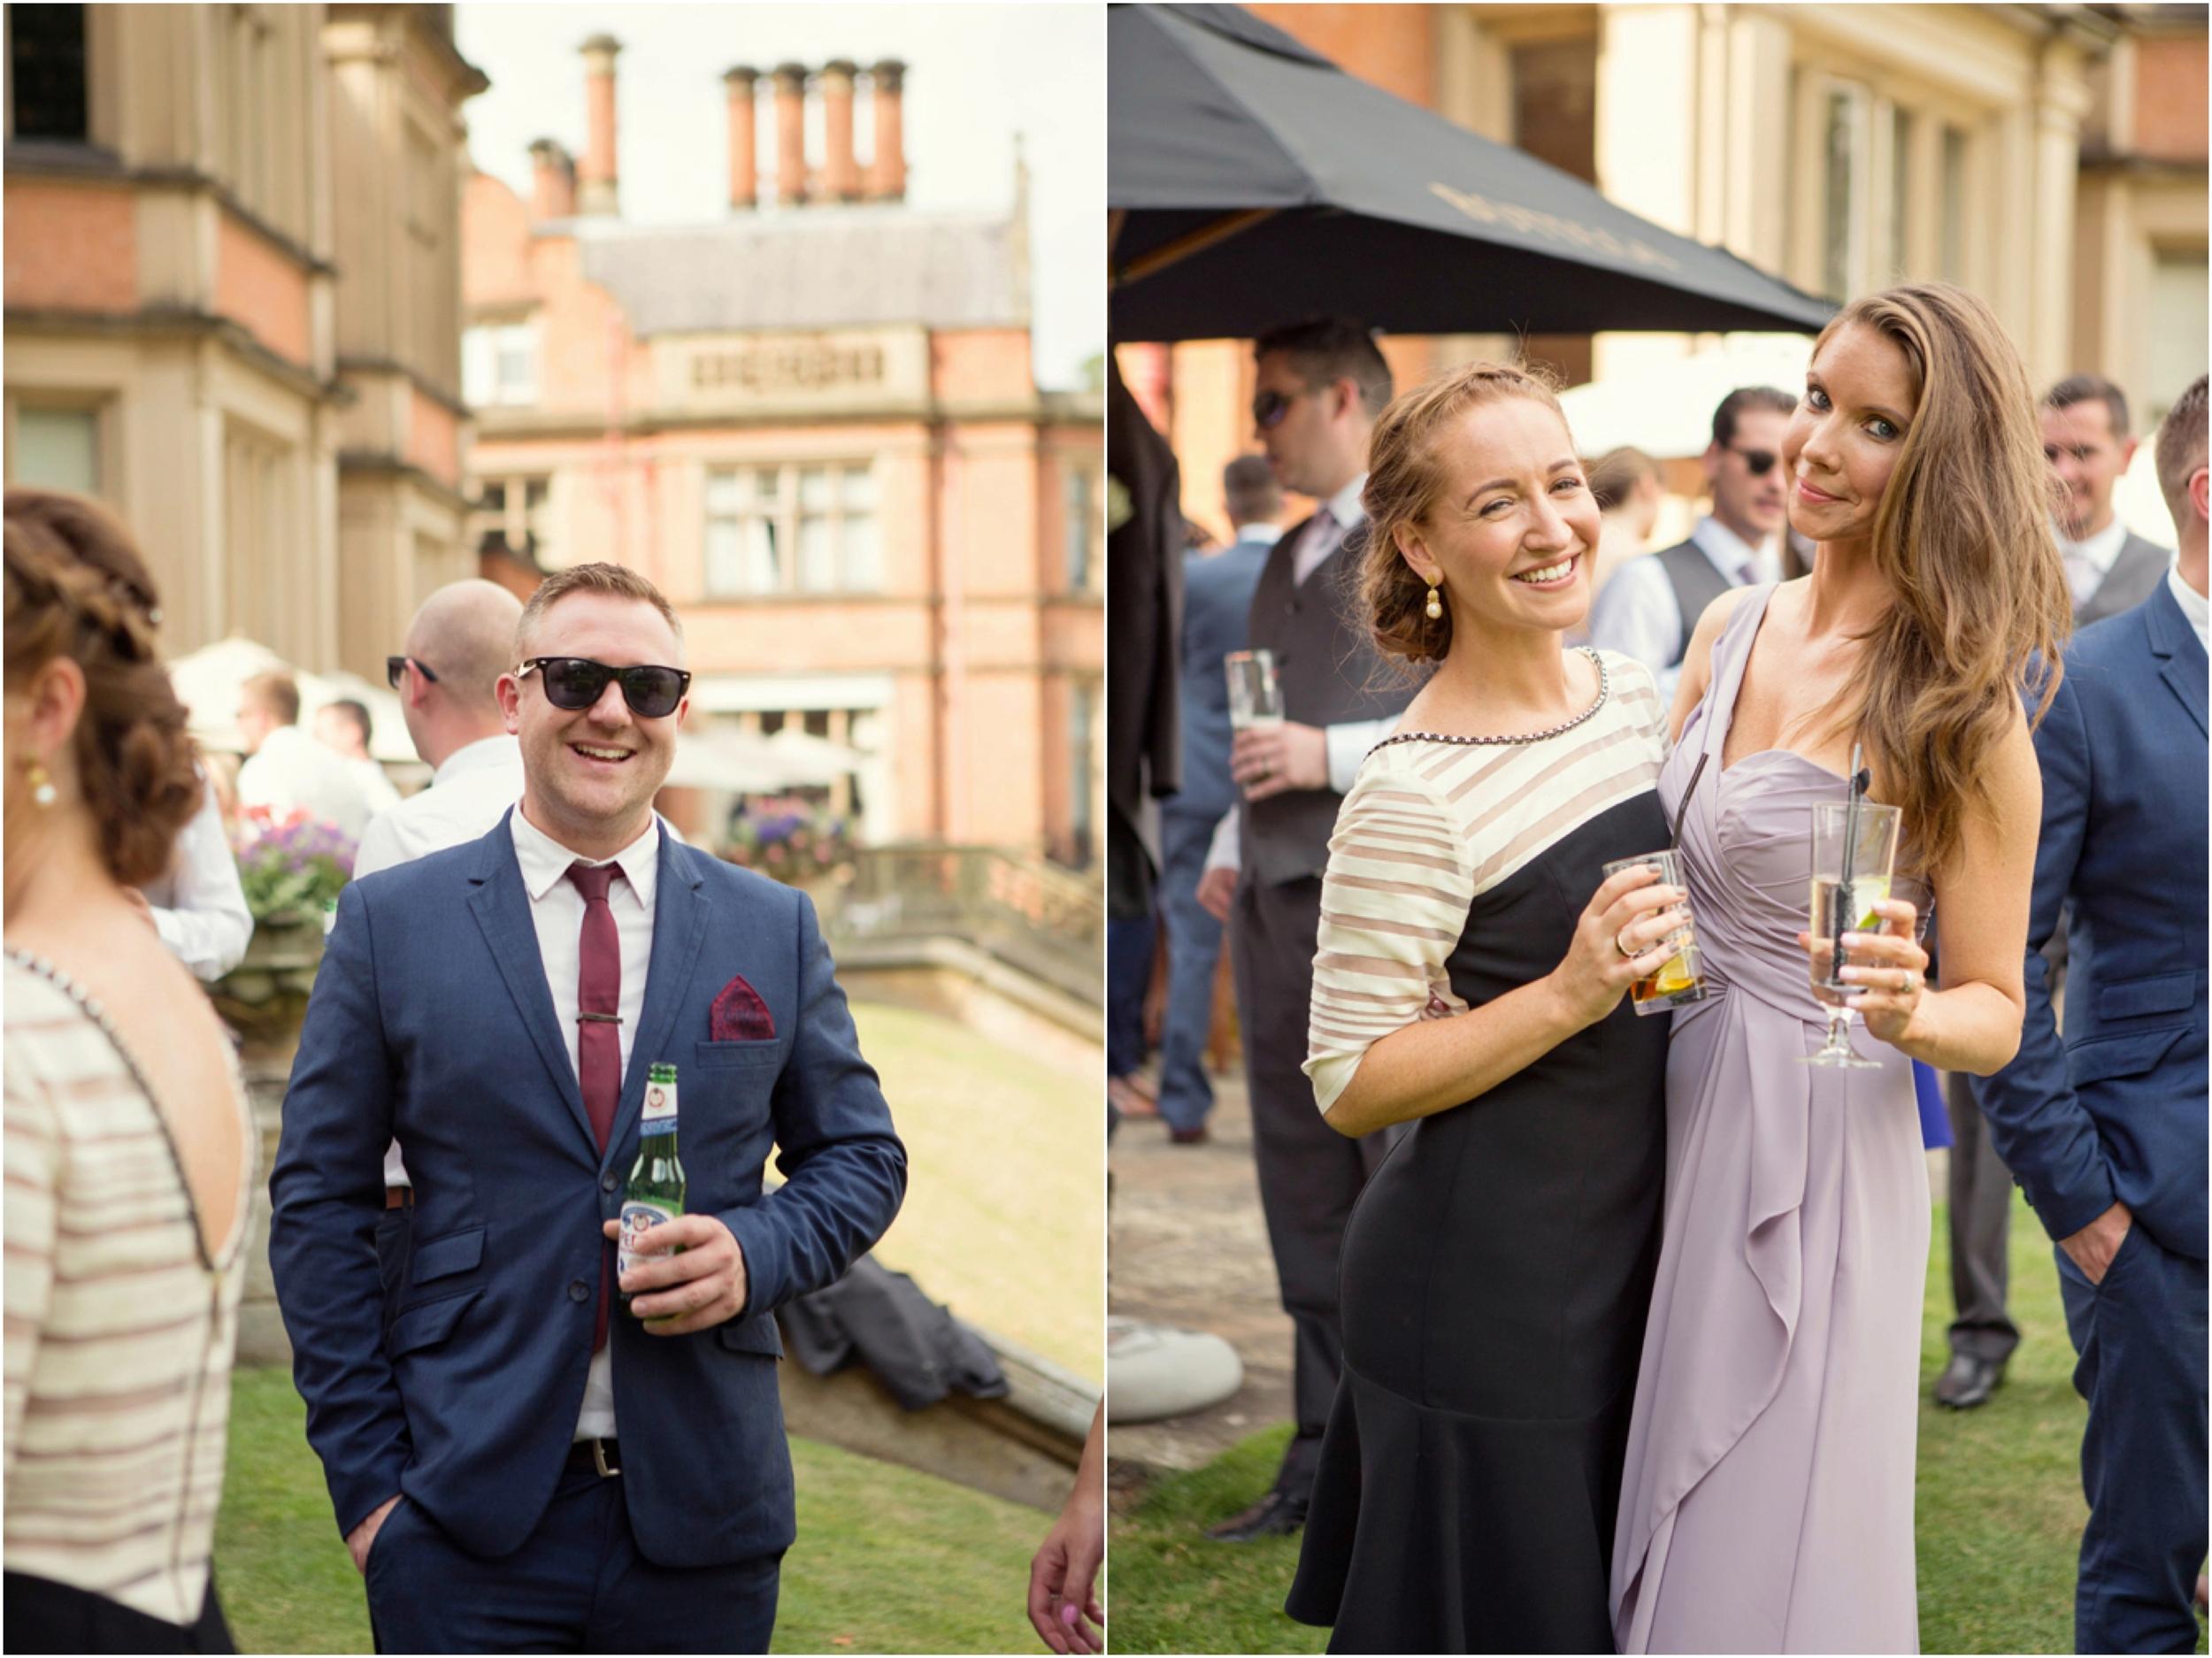 Sophie Evans Photography, Warwickshire Wedding Photography, Welcombe Hotel  (70).jpg